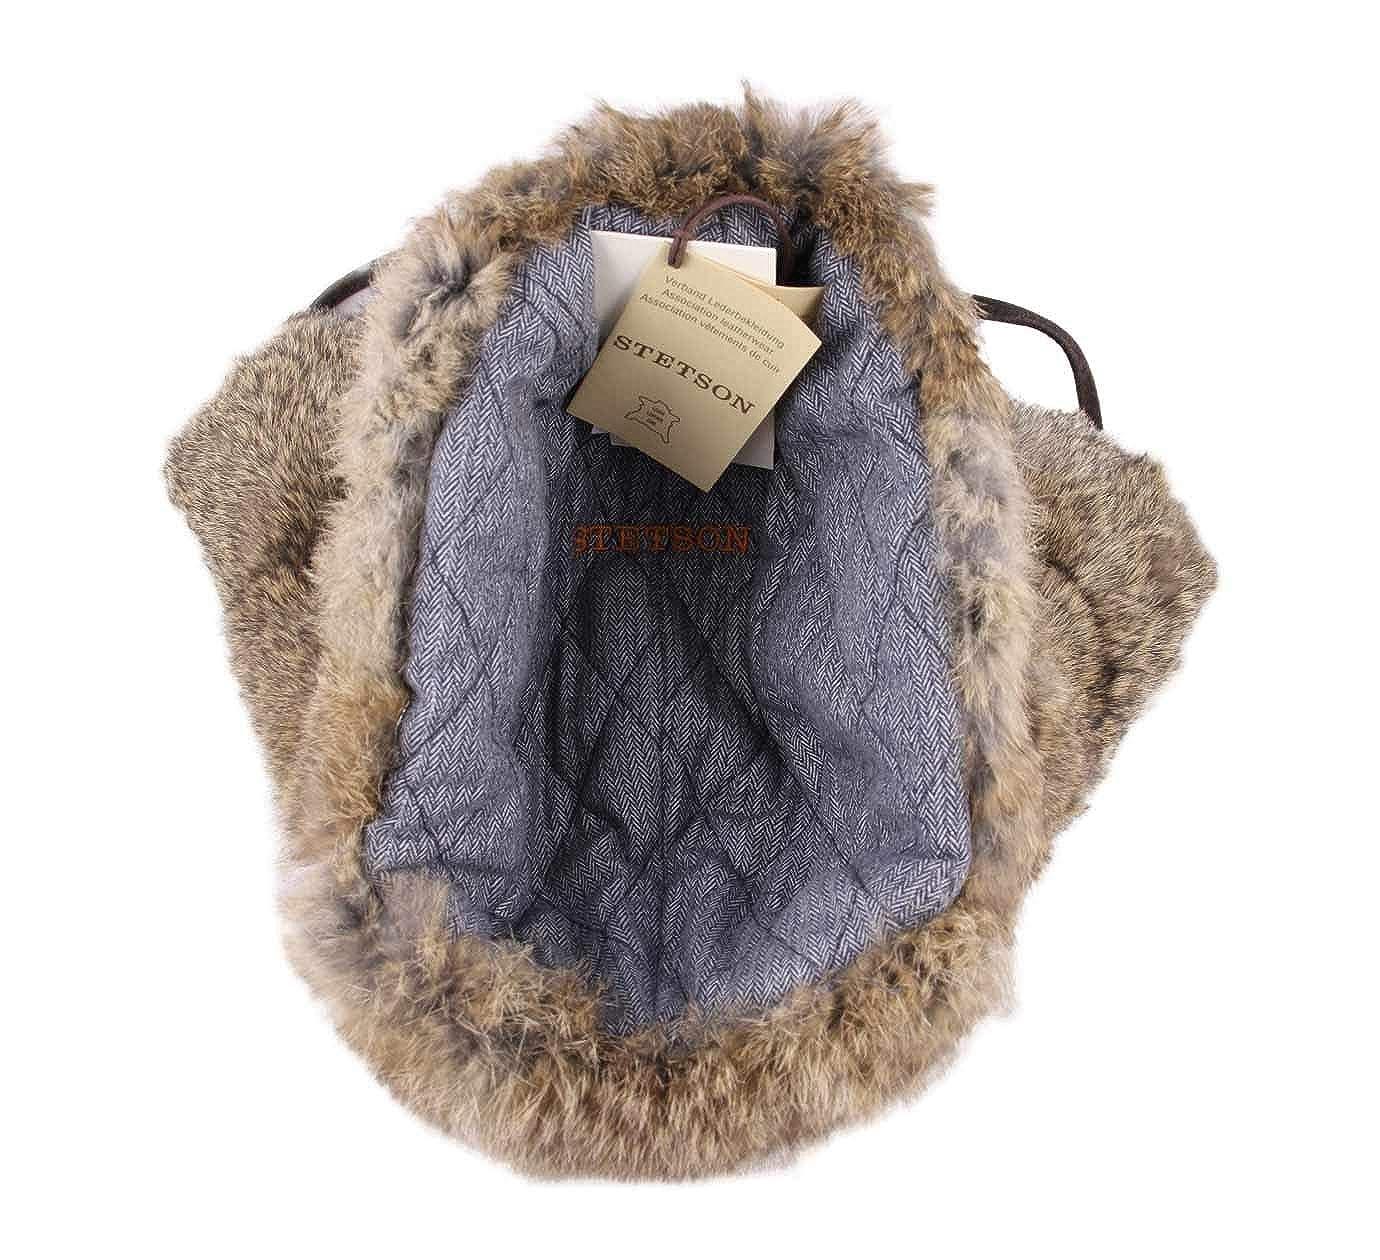 2b68d14a7 Stetson - Trapper Hat Leather Men Bomber Cap Pigskin/Rabbit - Size L ...